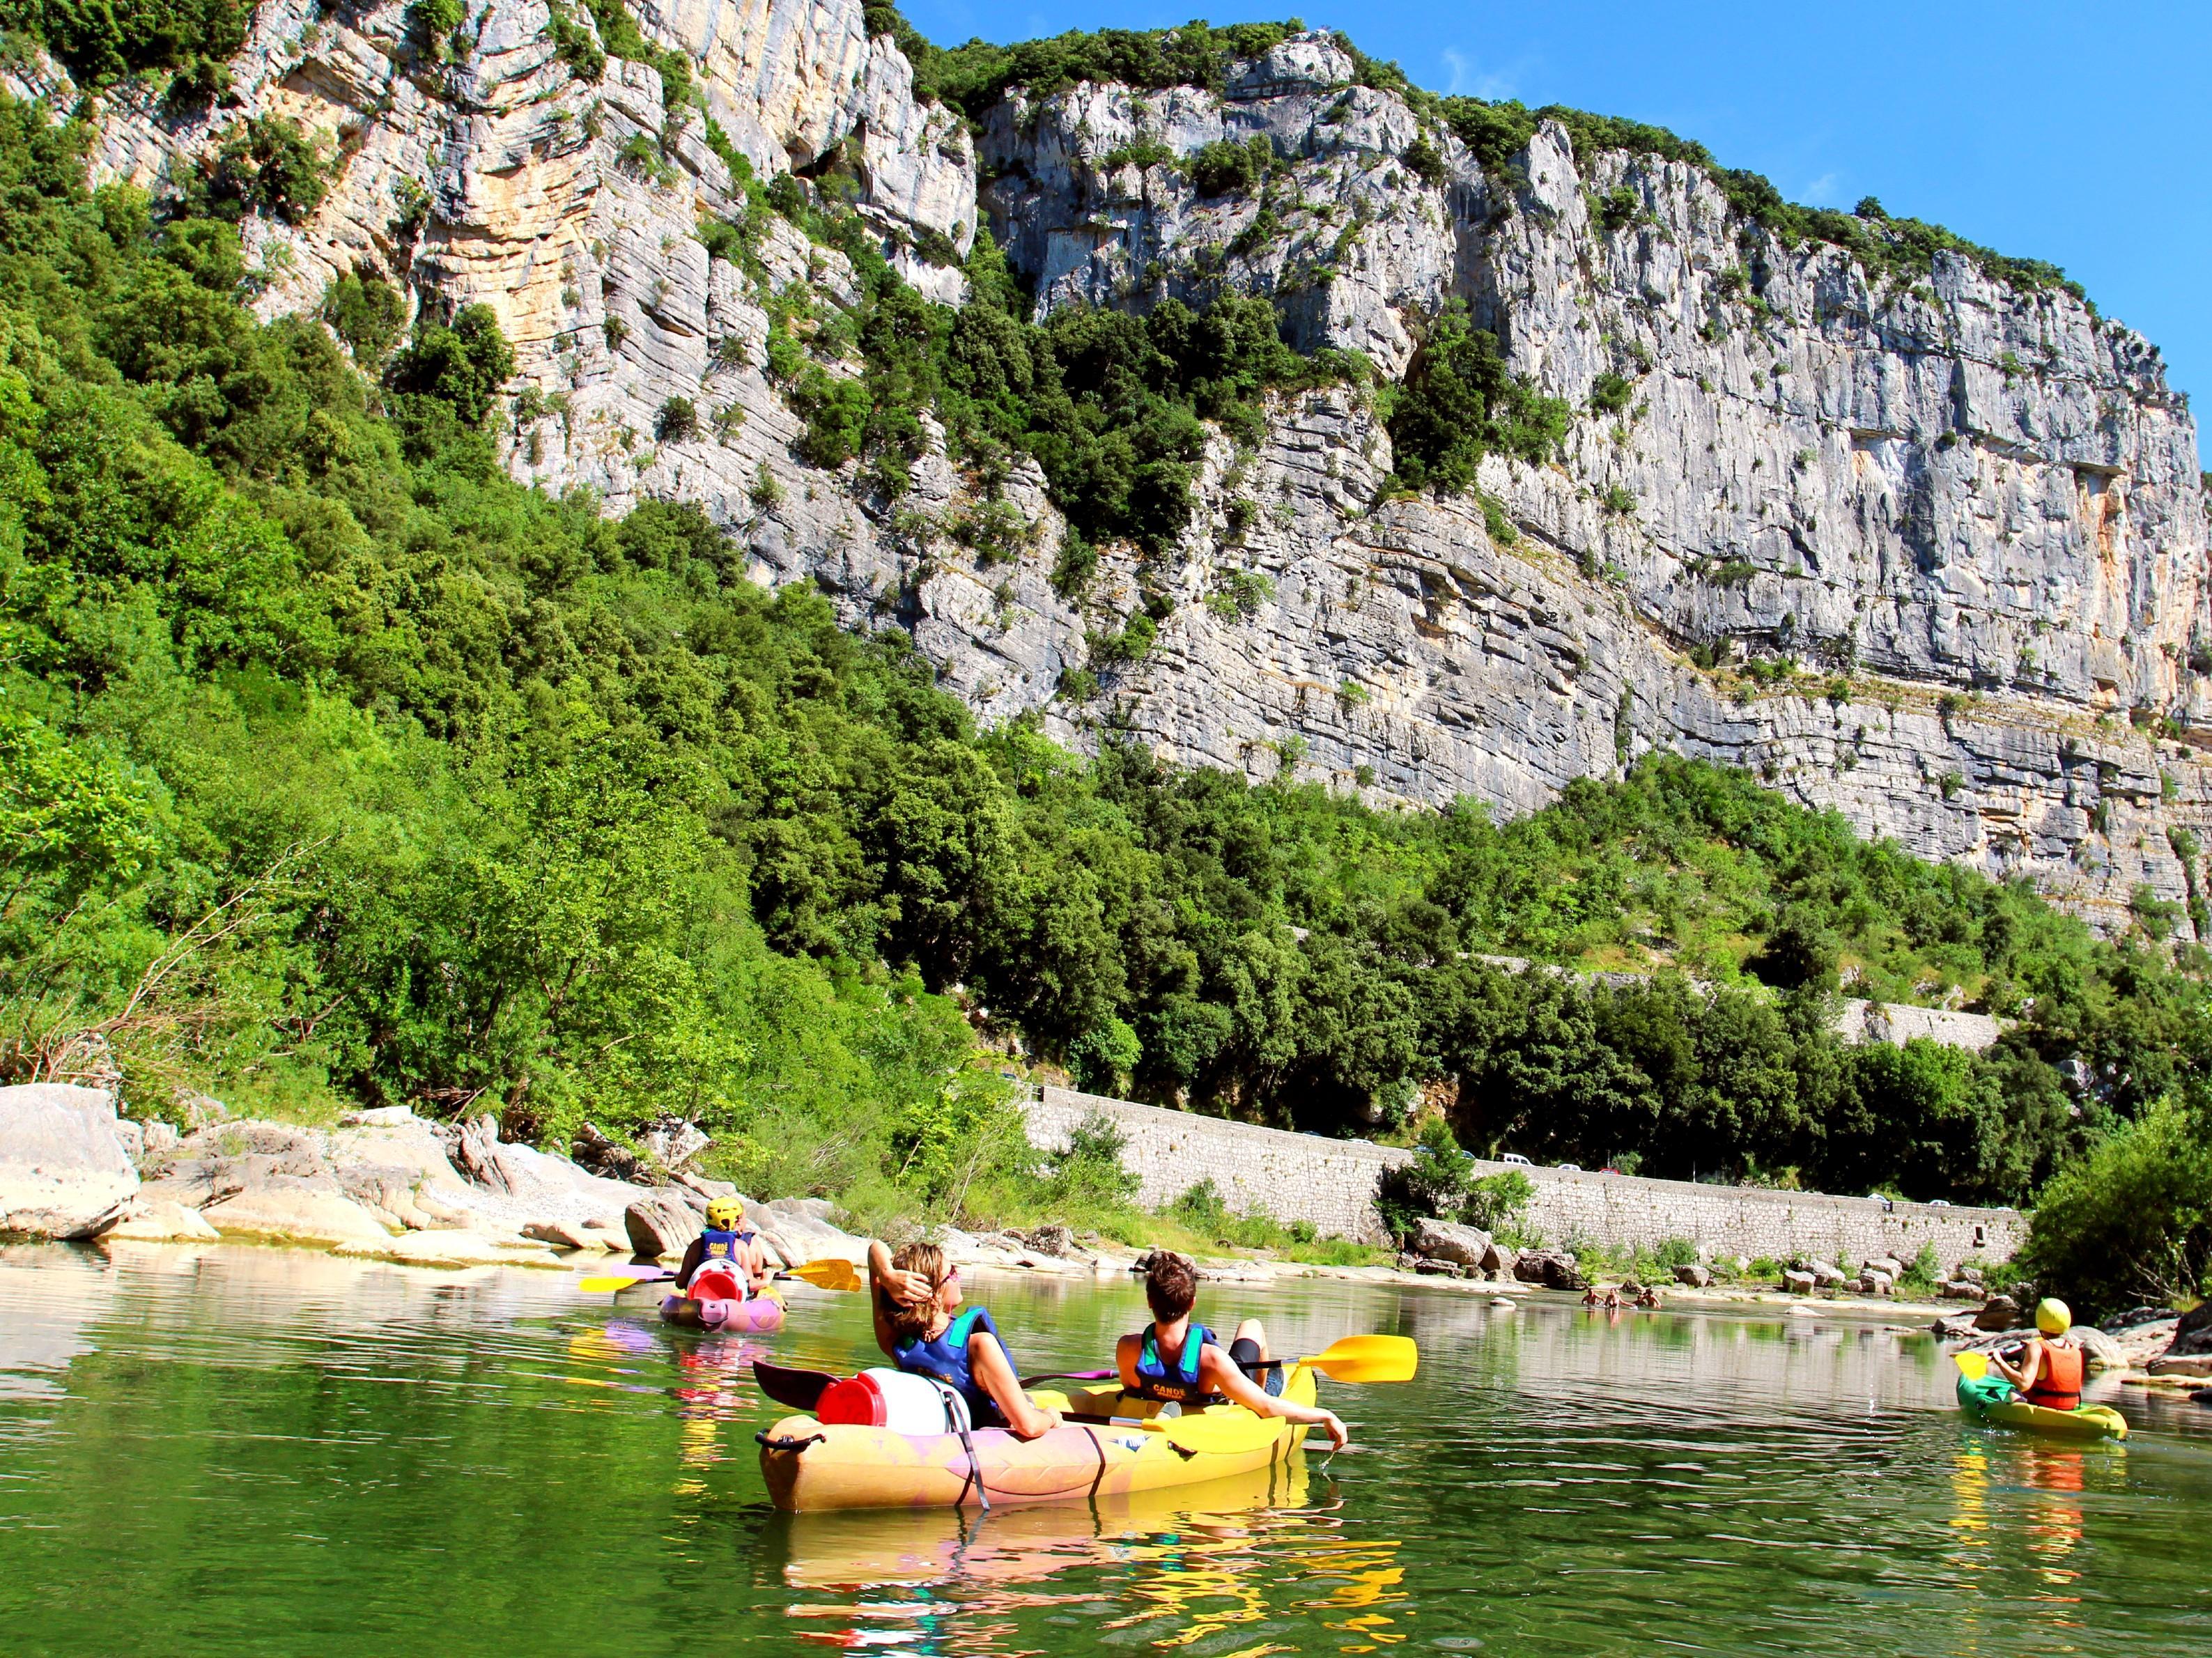 Eenvoudige Kanoën in Agonès - Gorges de l'Hérault